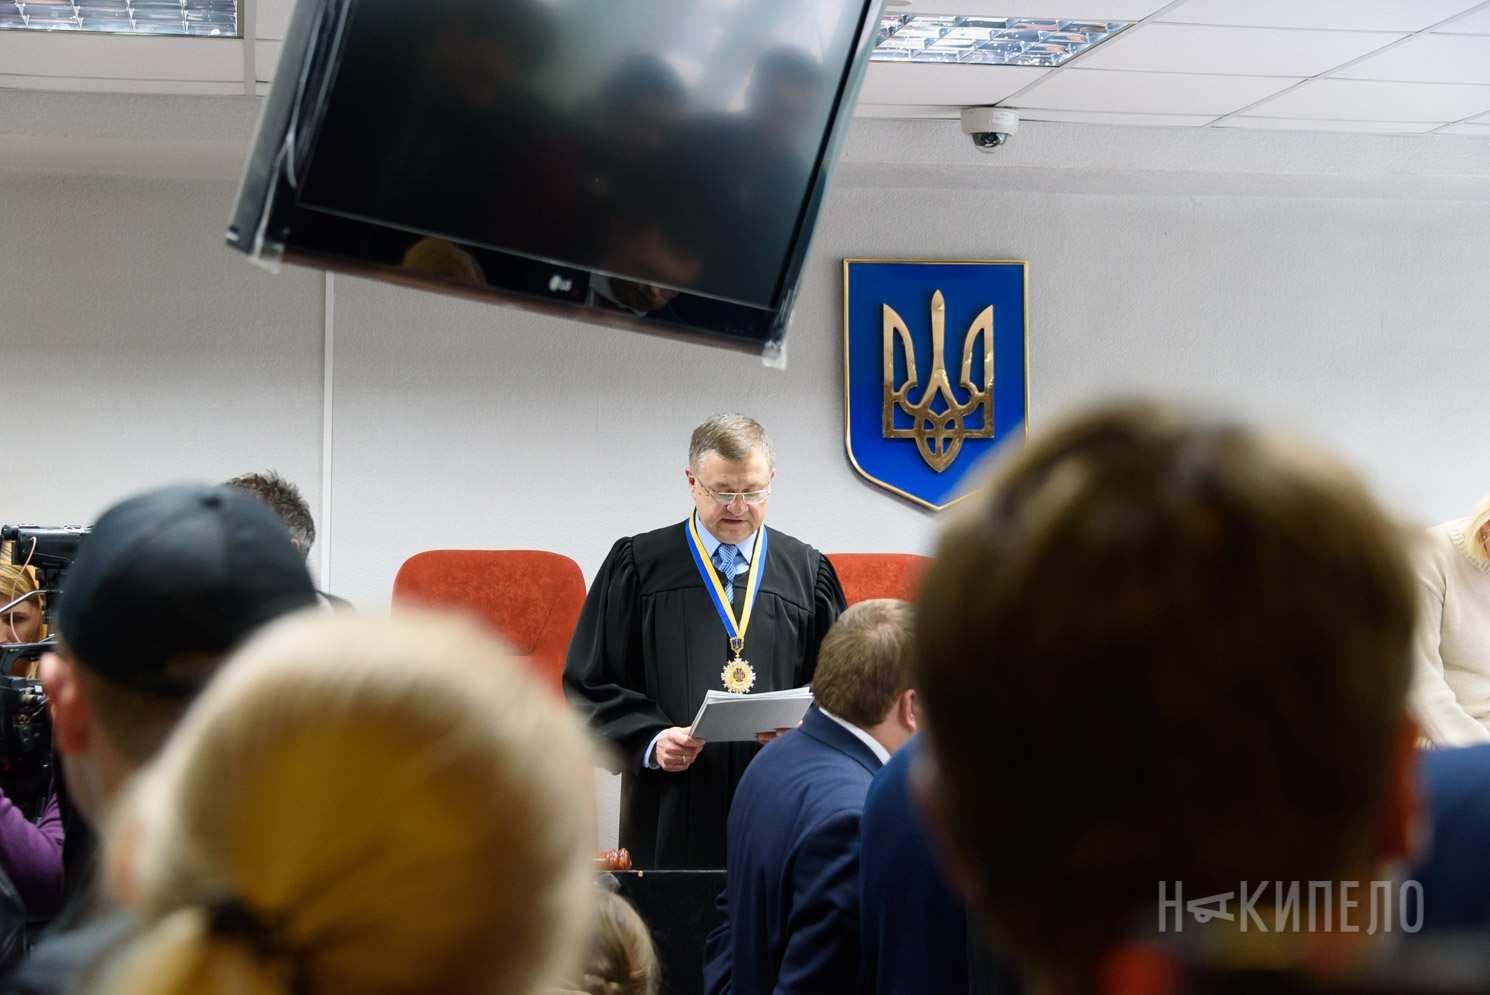 Суд зайцева дронов дтп харьков судья